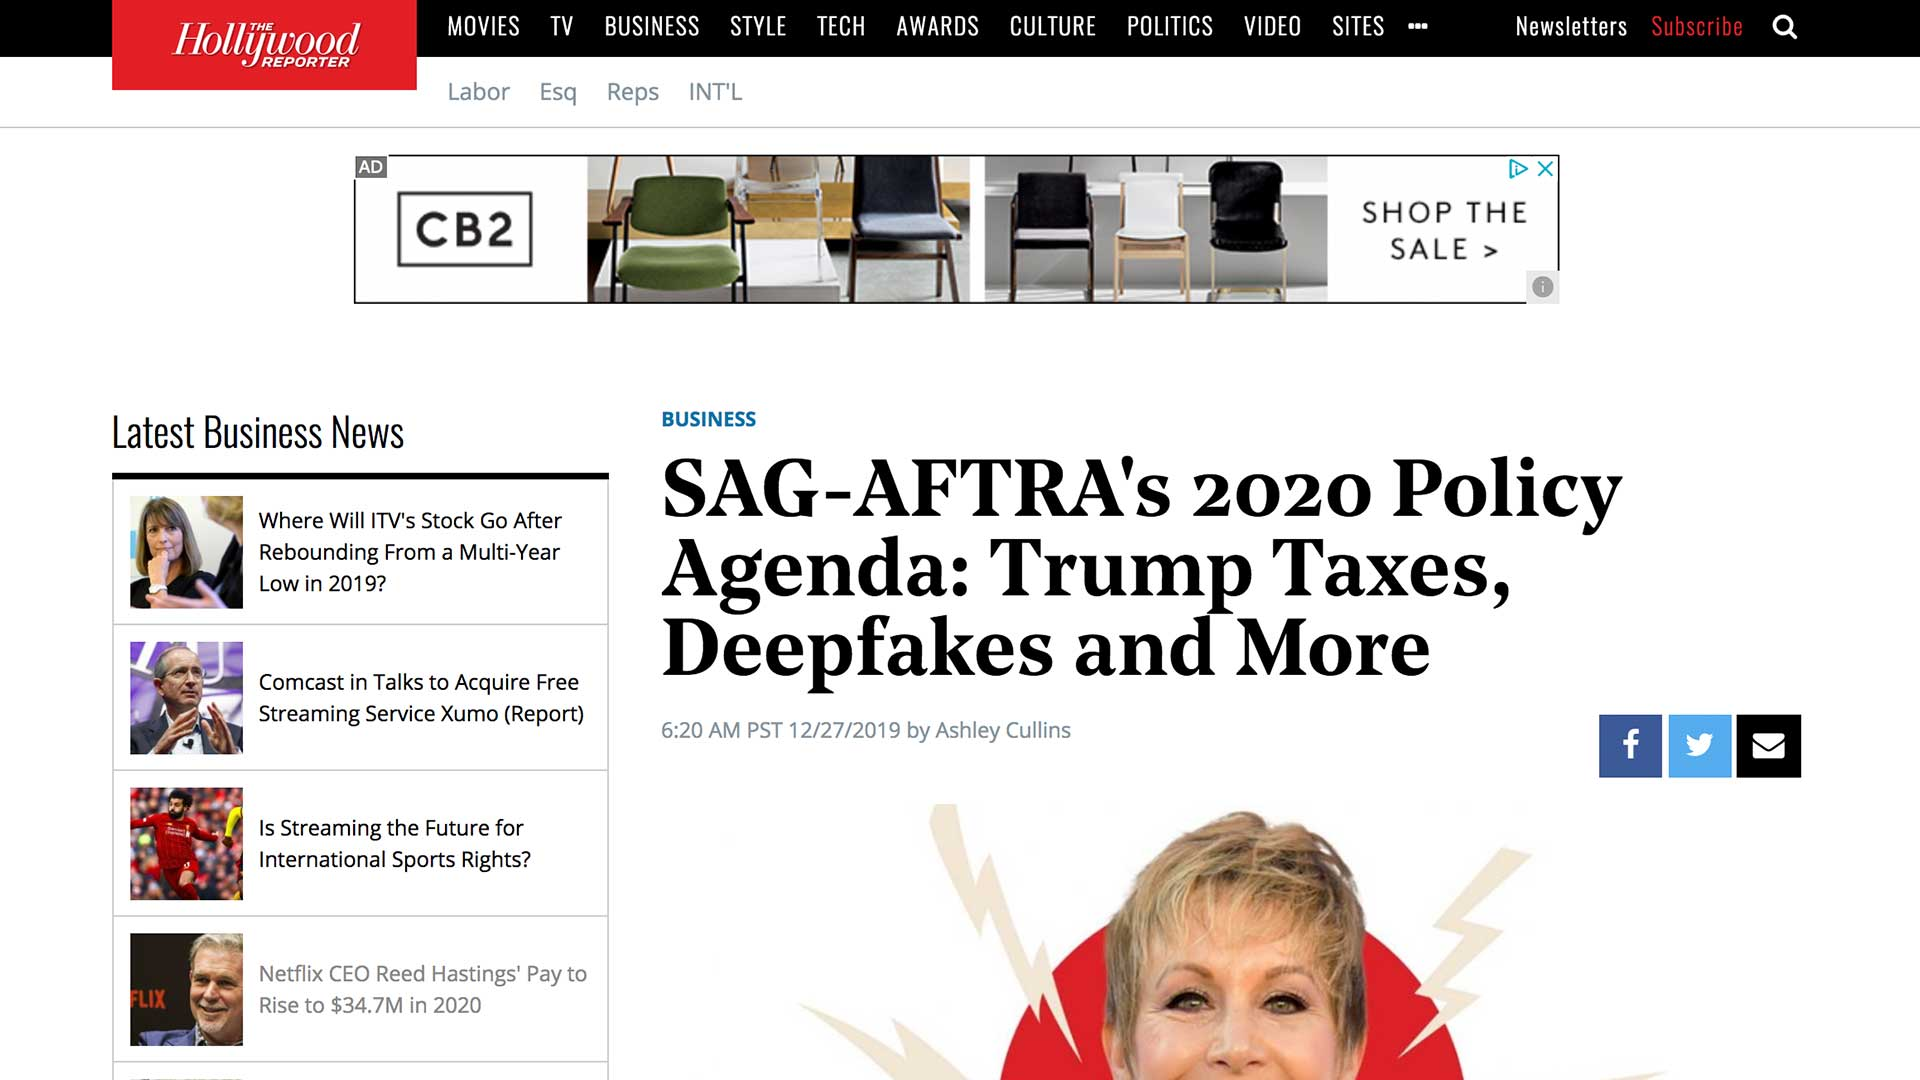 Fairness Rocks News SAG-AFTRA's 2020 Policy Agenda: Trump Taxes, Deepfakes and More